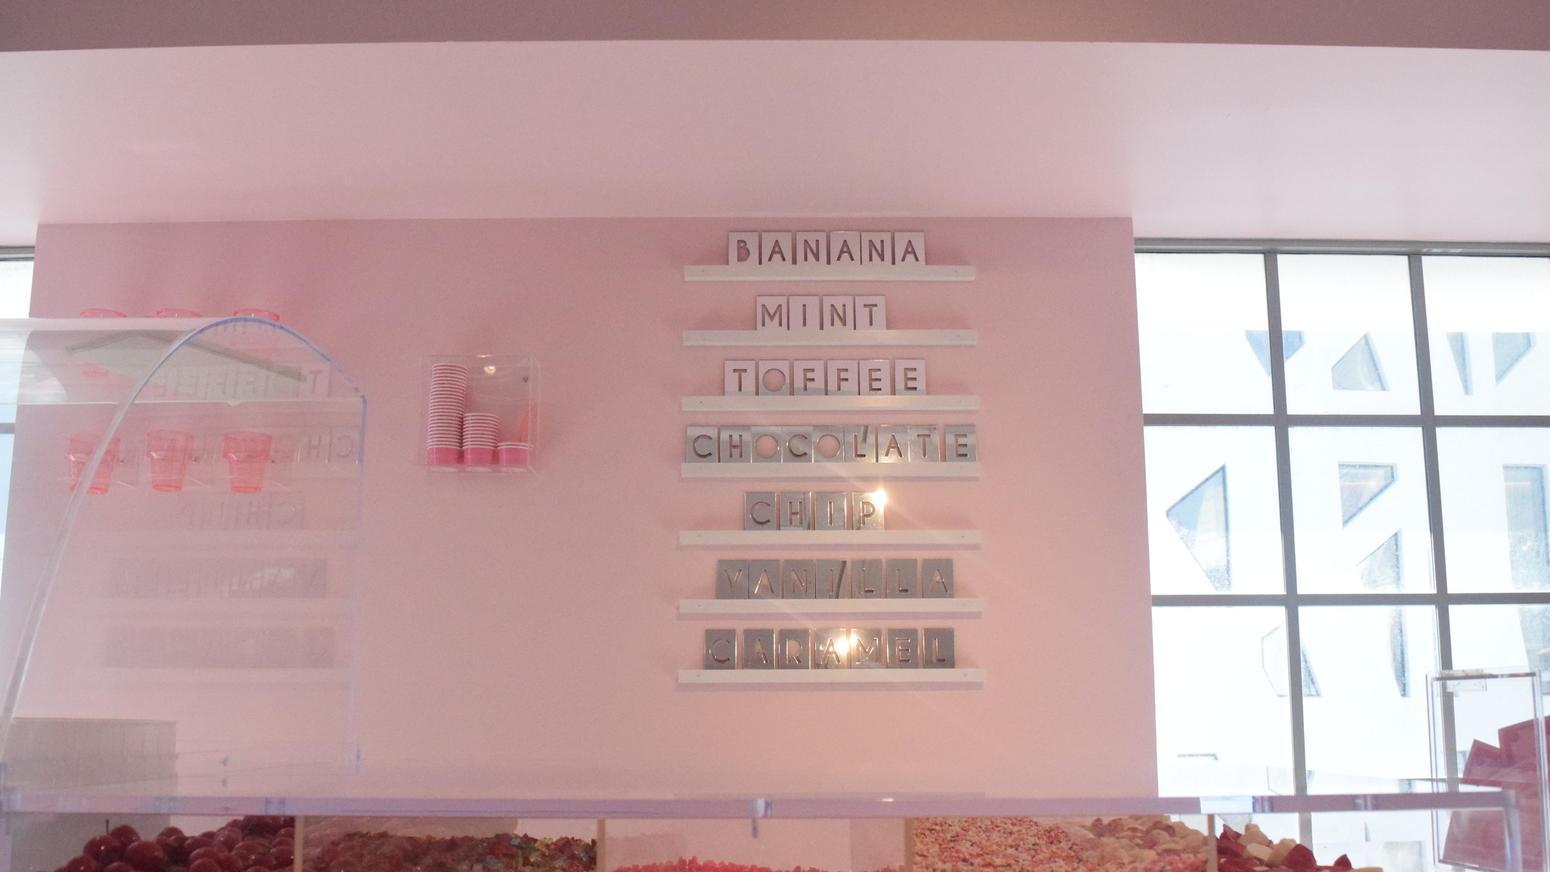 sfl-art-basel-2017-museum-ice-cream-photos-011